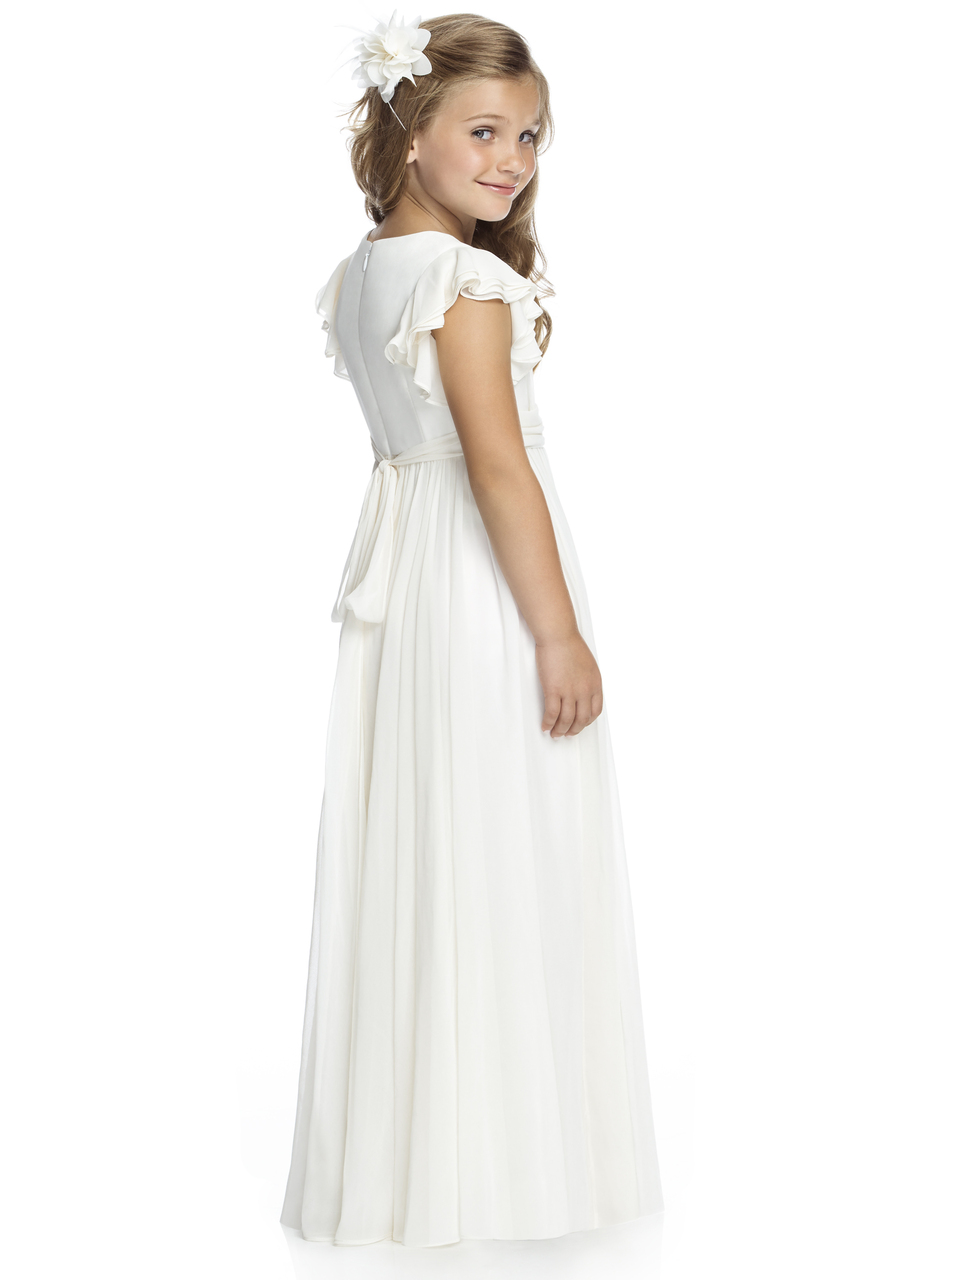 a57bfbf51ee Dessy Flowergirl Dresses - Dessy Flower Girl Dress FL4038